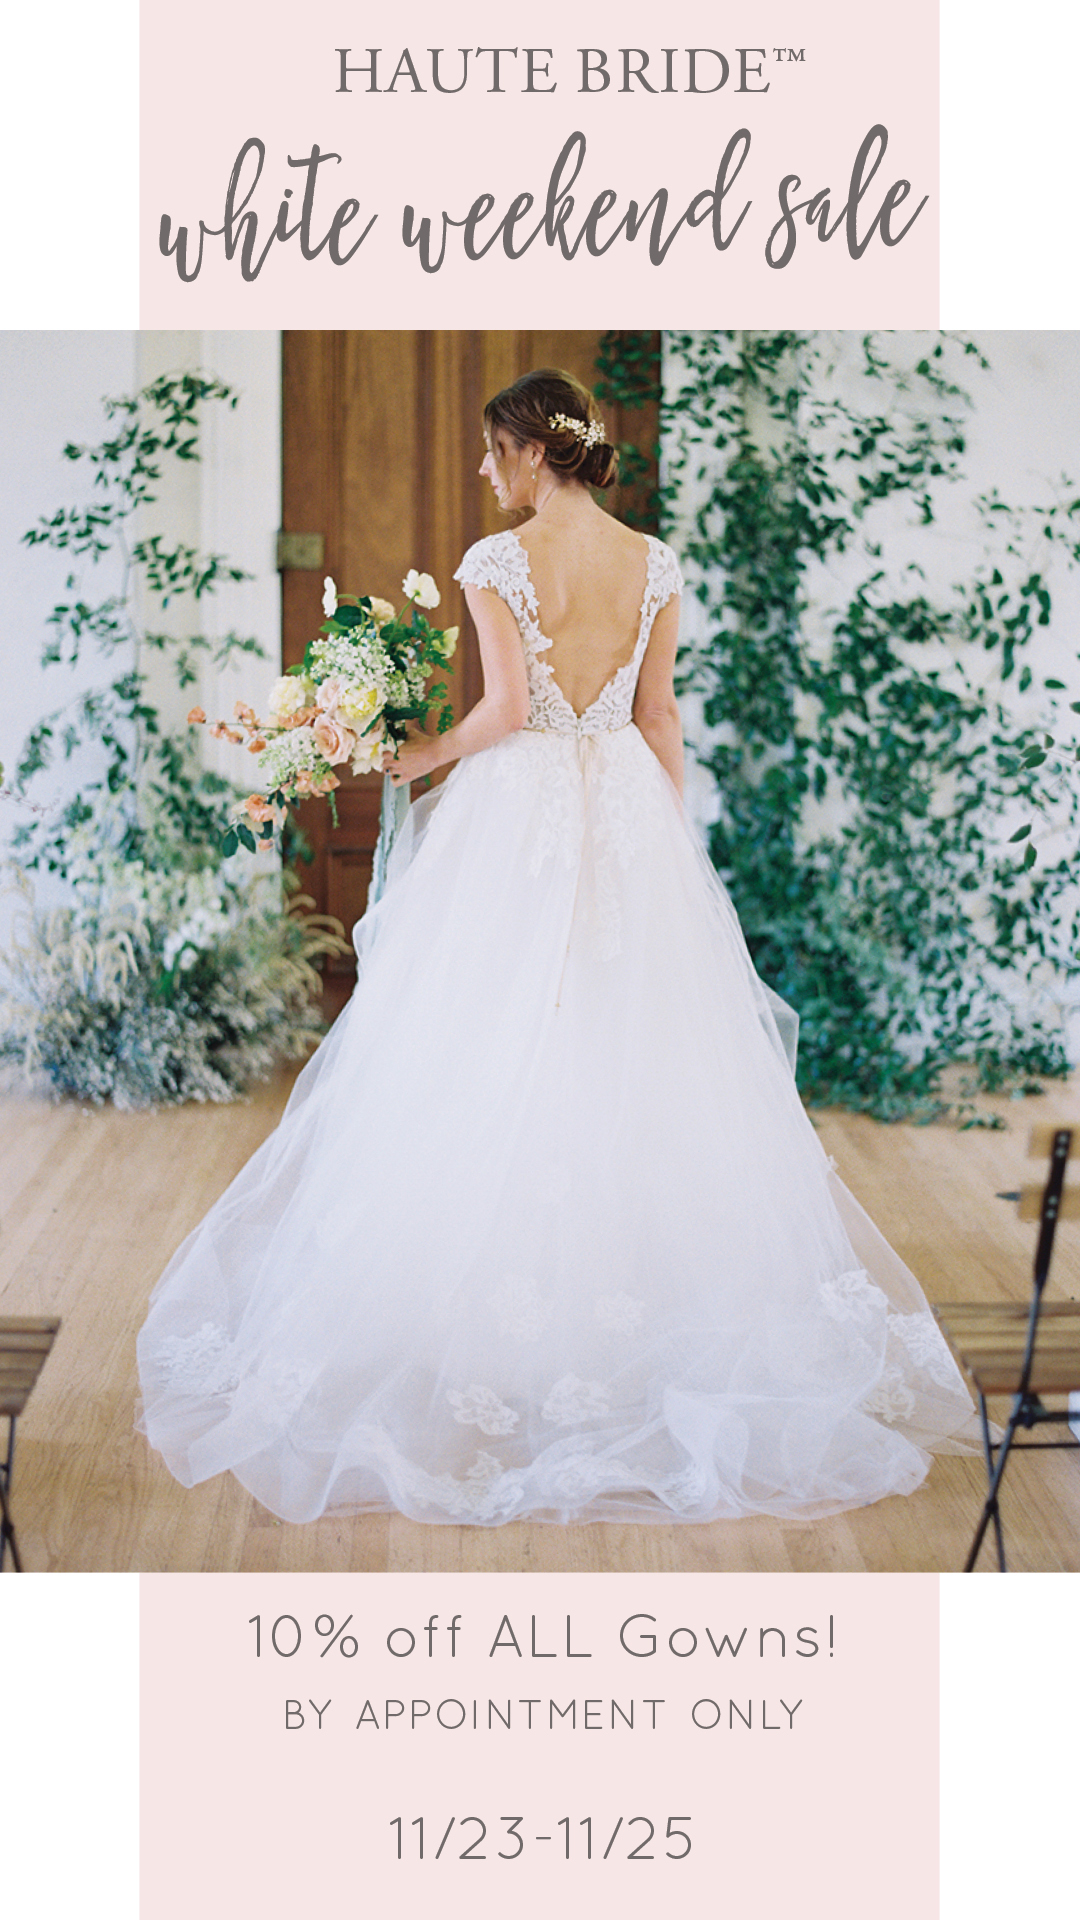 Haute Bride White Weekend Sale